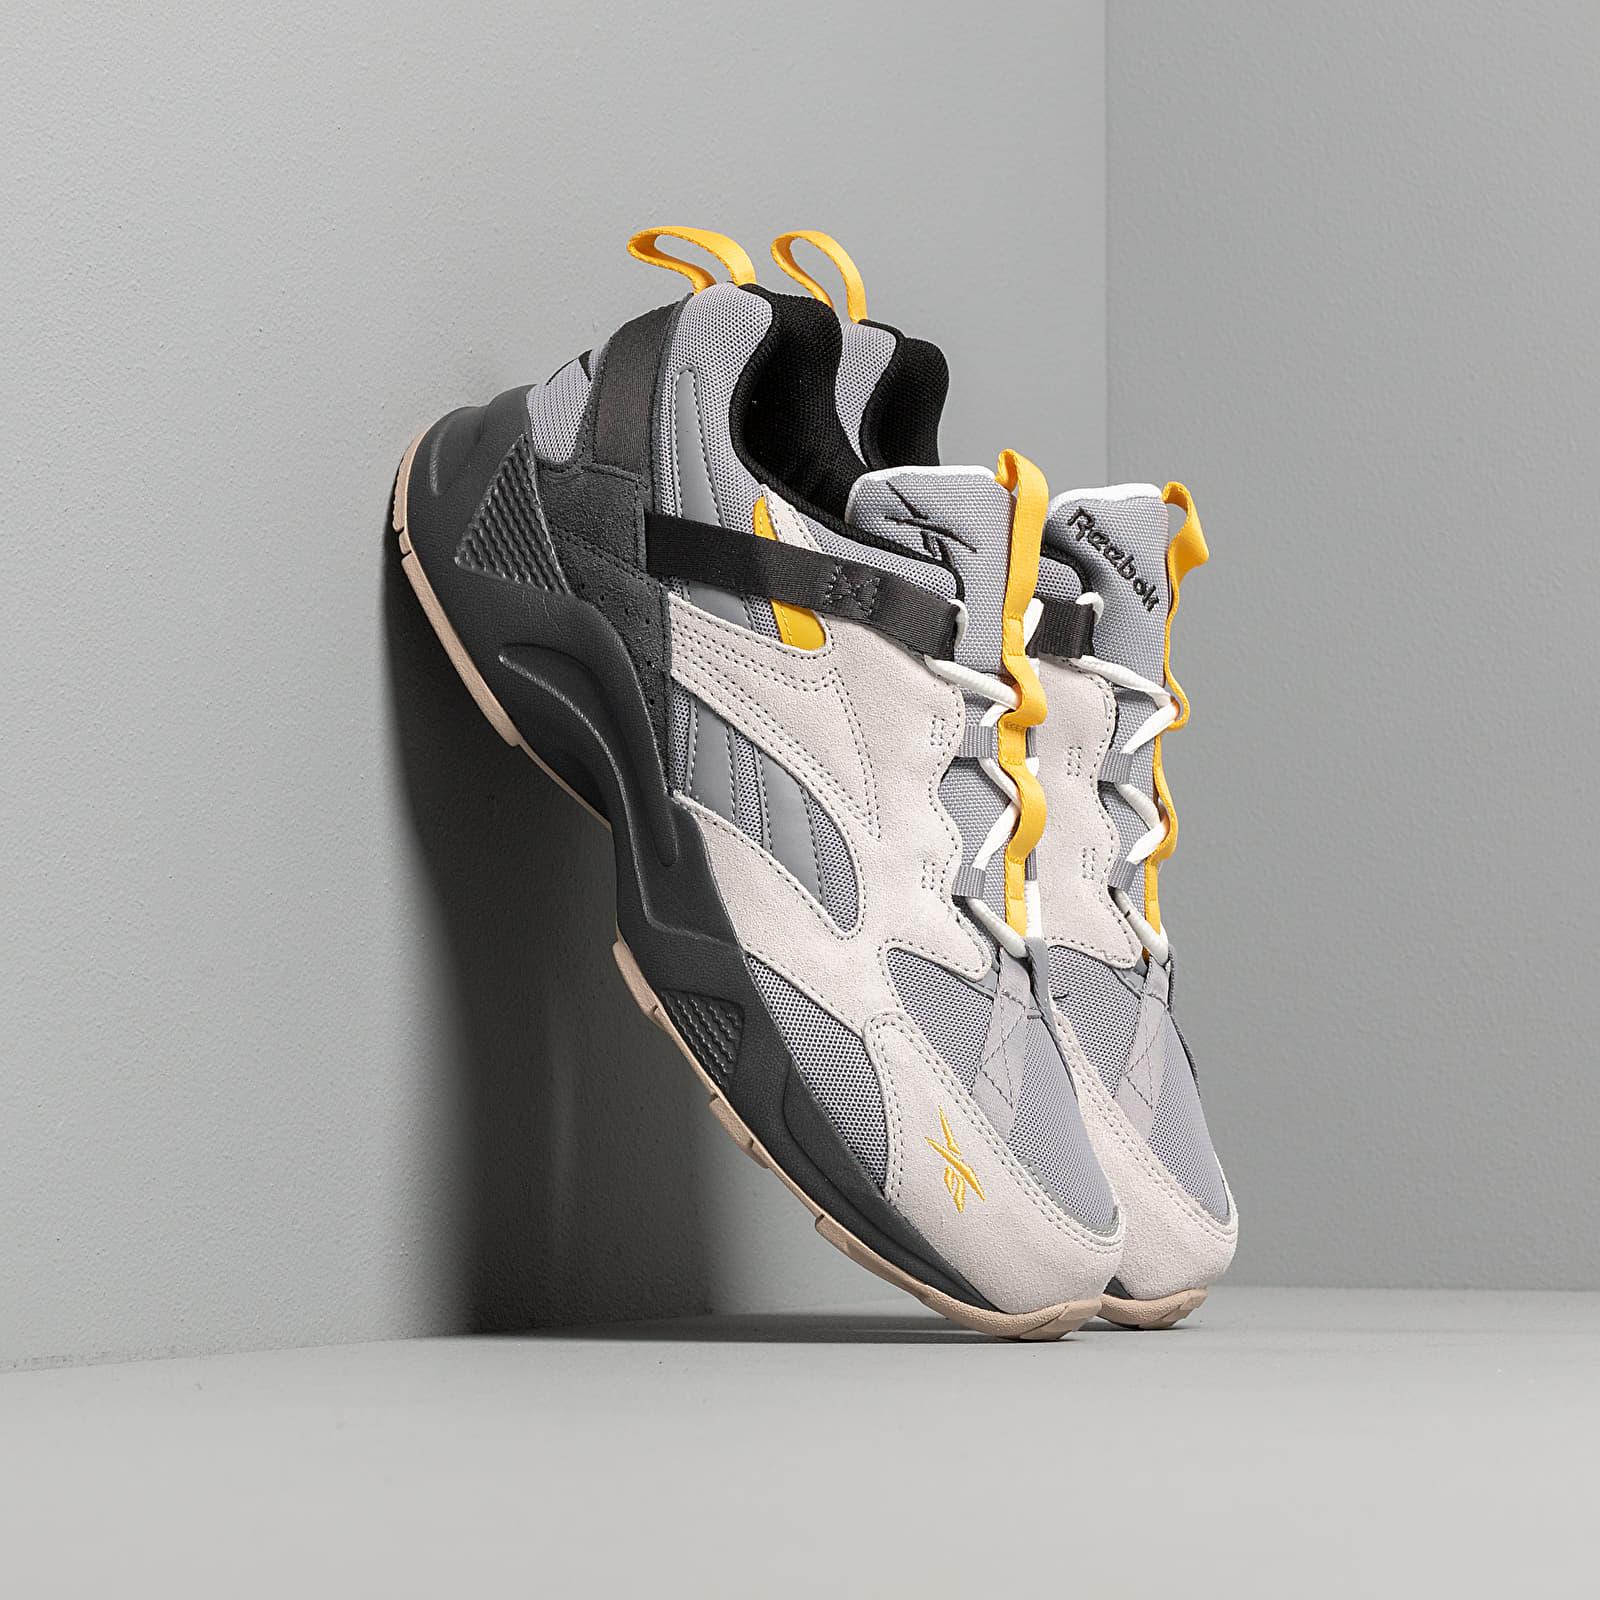 Men's shoes Reebok Aztrek 96 Adventure Porcelain/ Cool Shadow/ True Grey 8